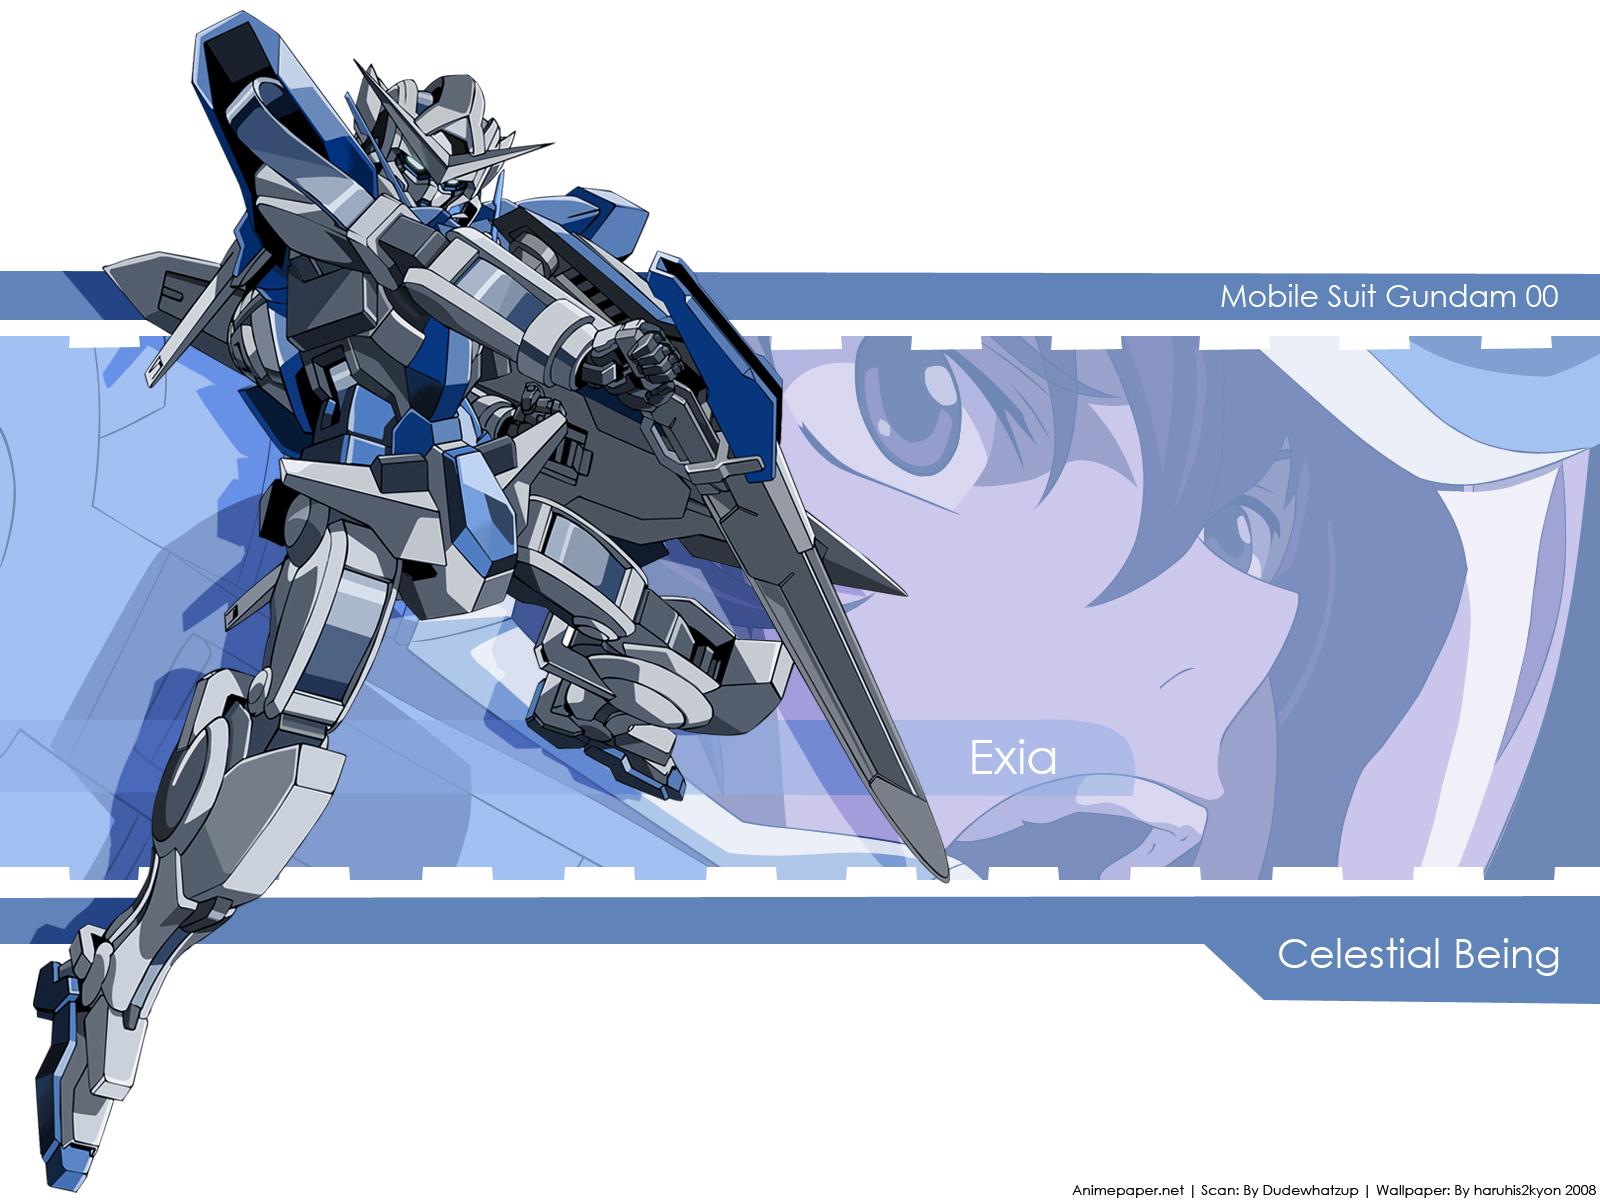 Mobile Suit Gundam 00 Wallpaper Exia Minitokyo